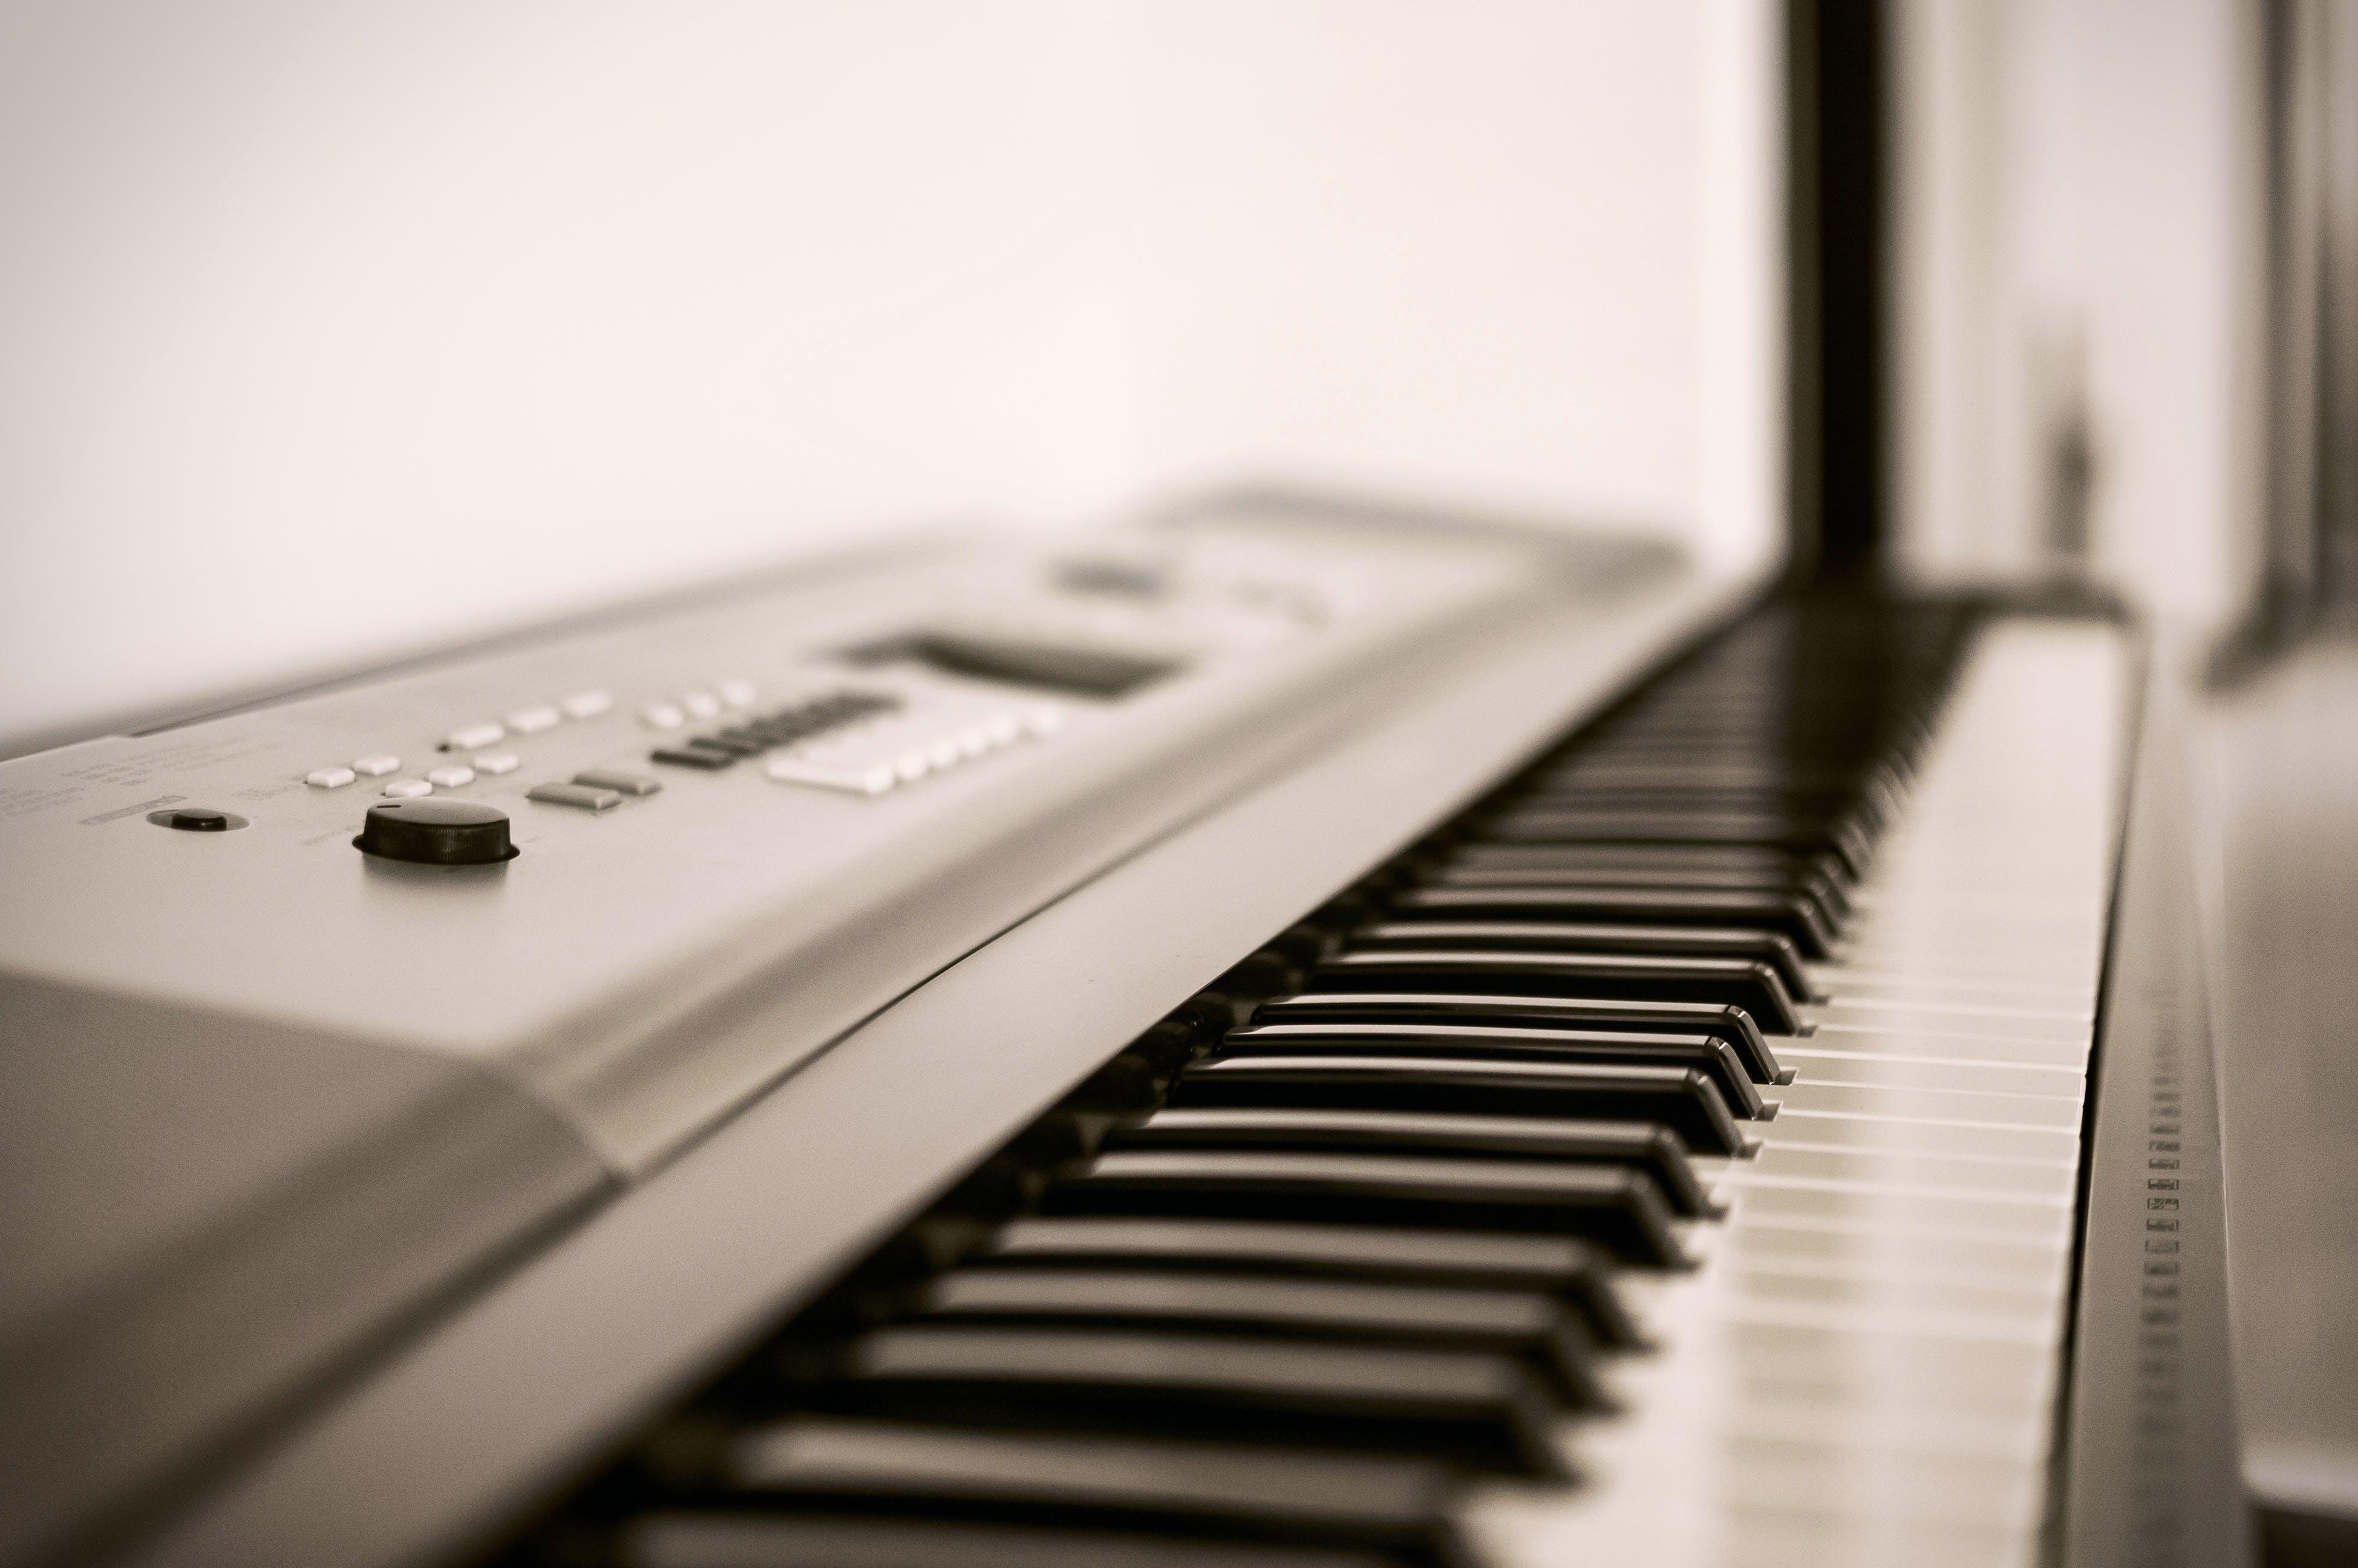 Free stock photo of music, piano, keyboard, white